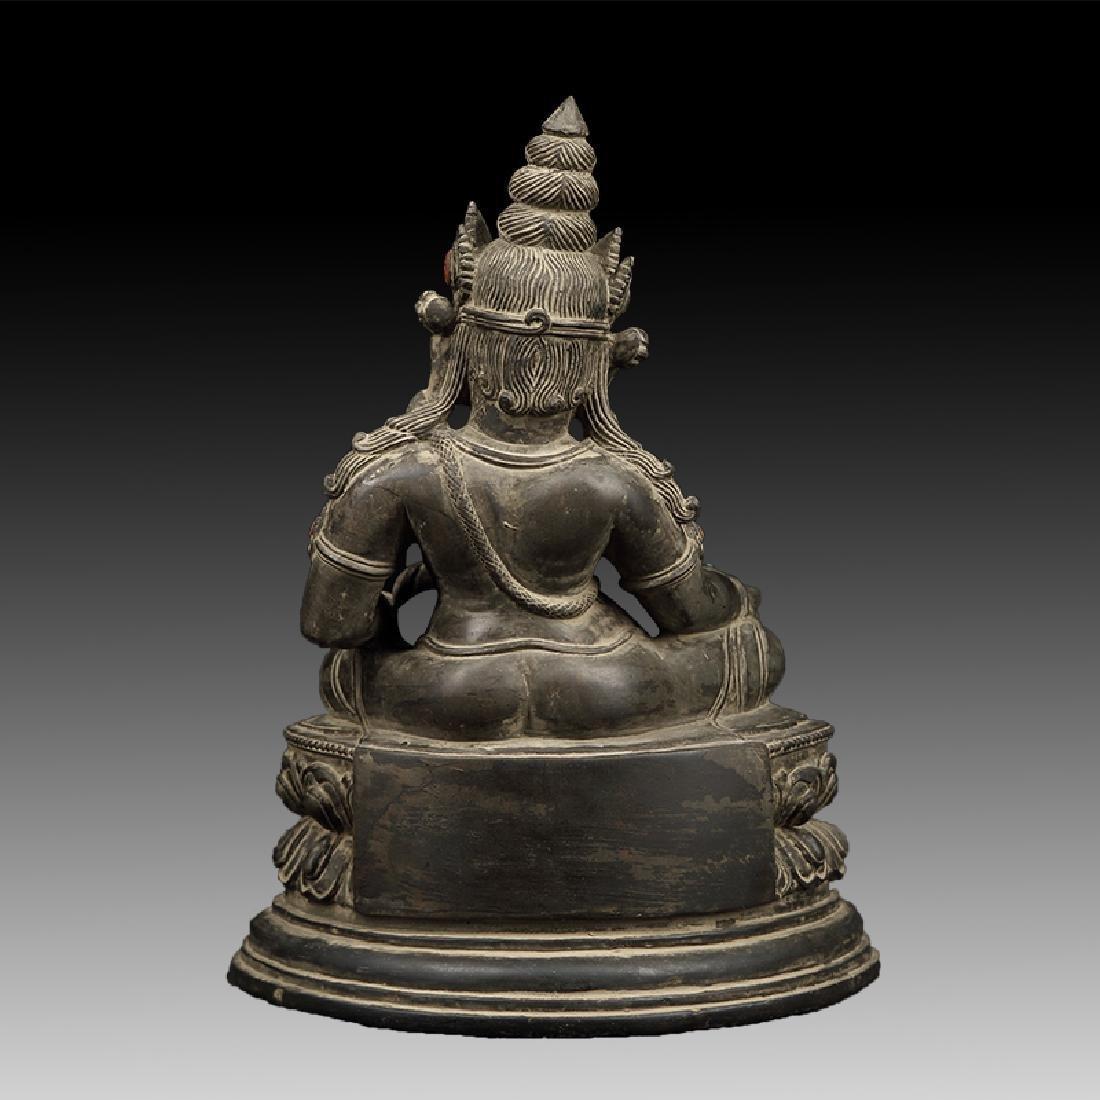 Chinese Antique Stone Buddha - 4